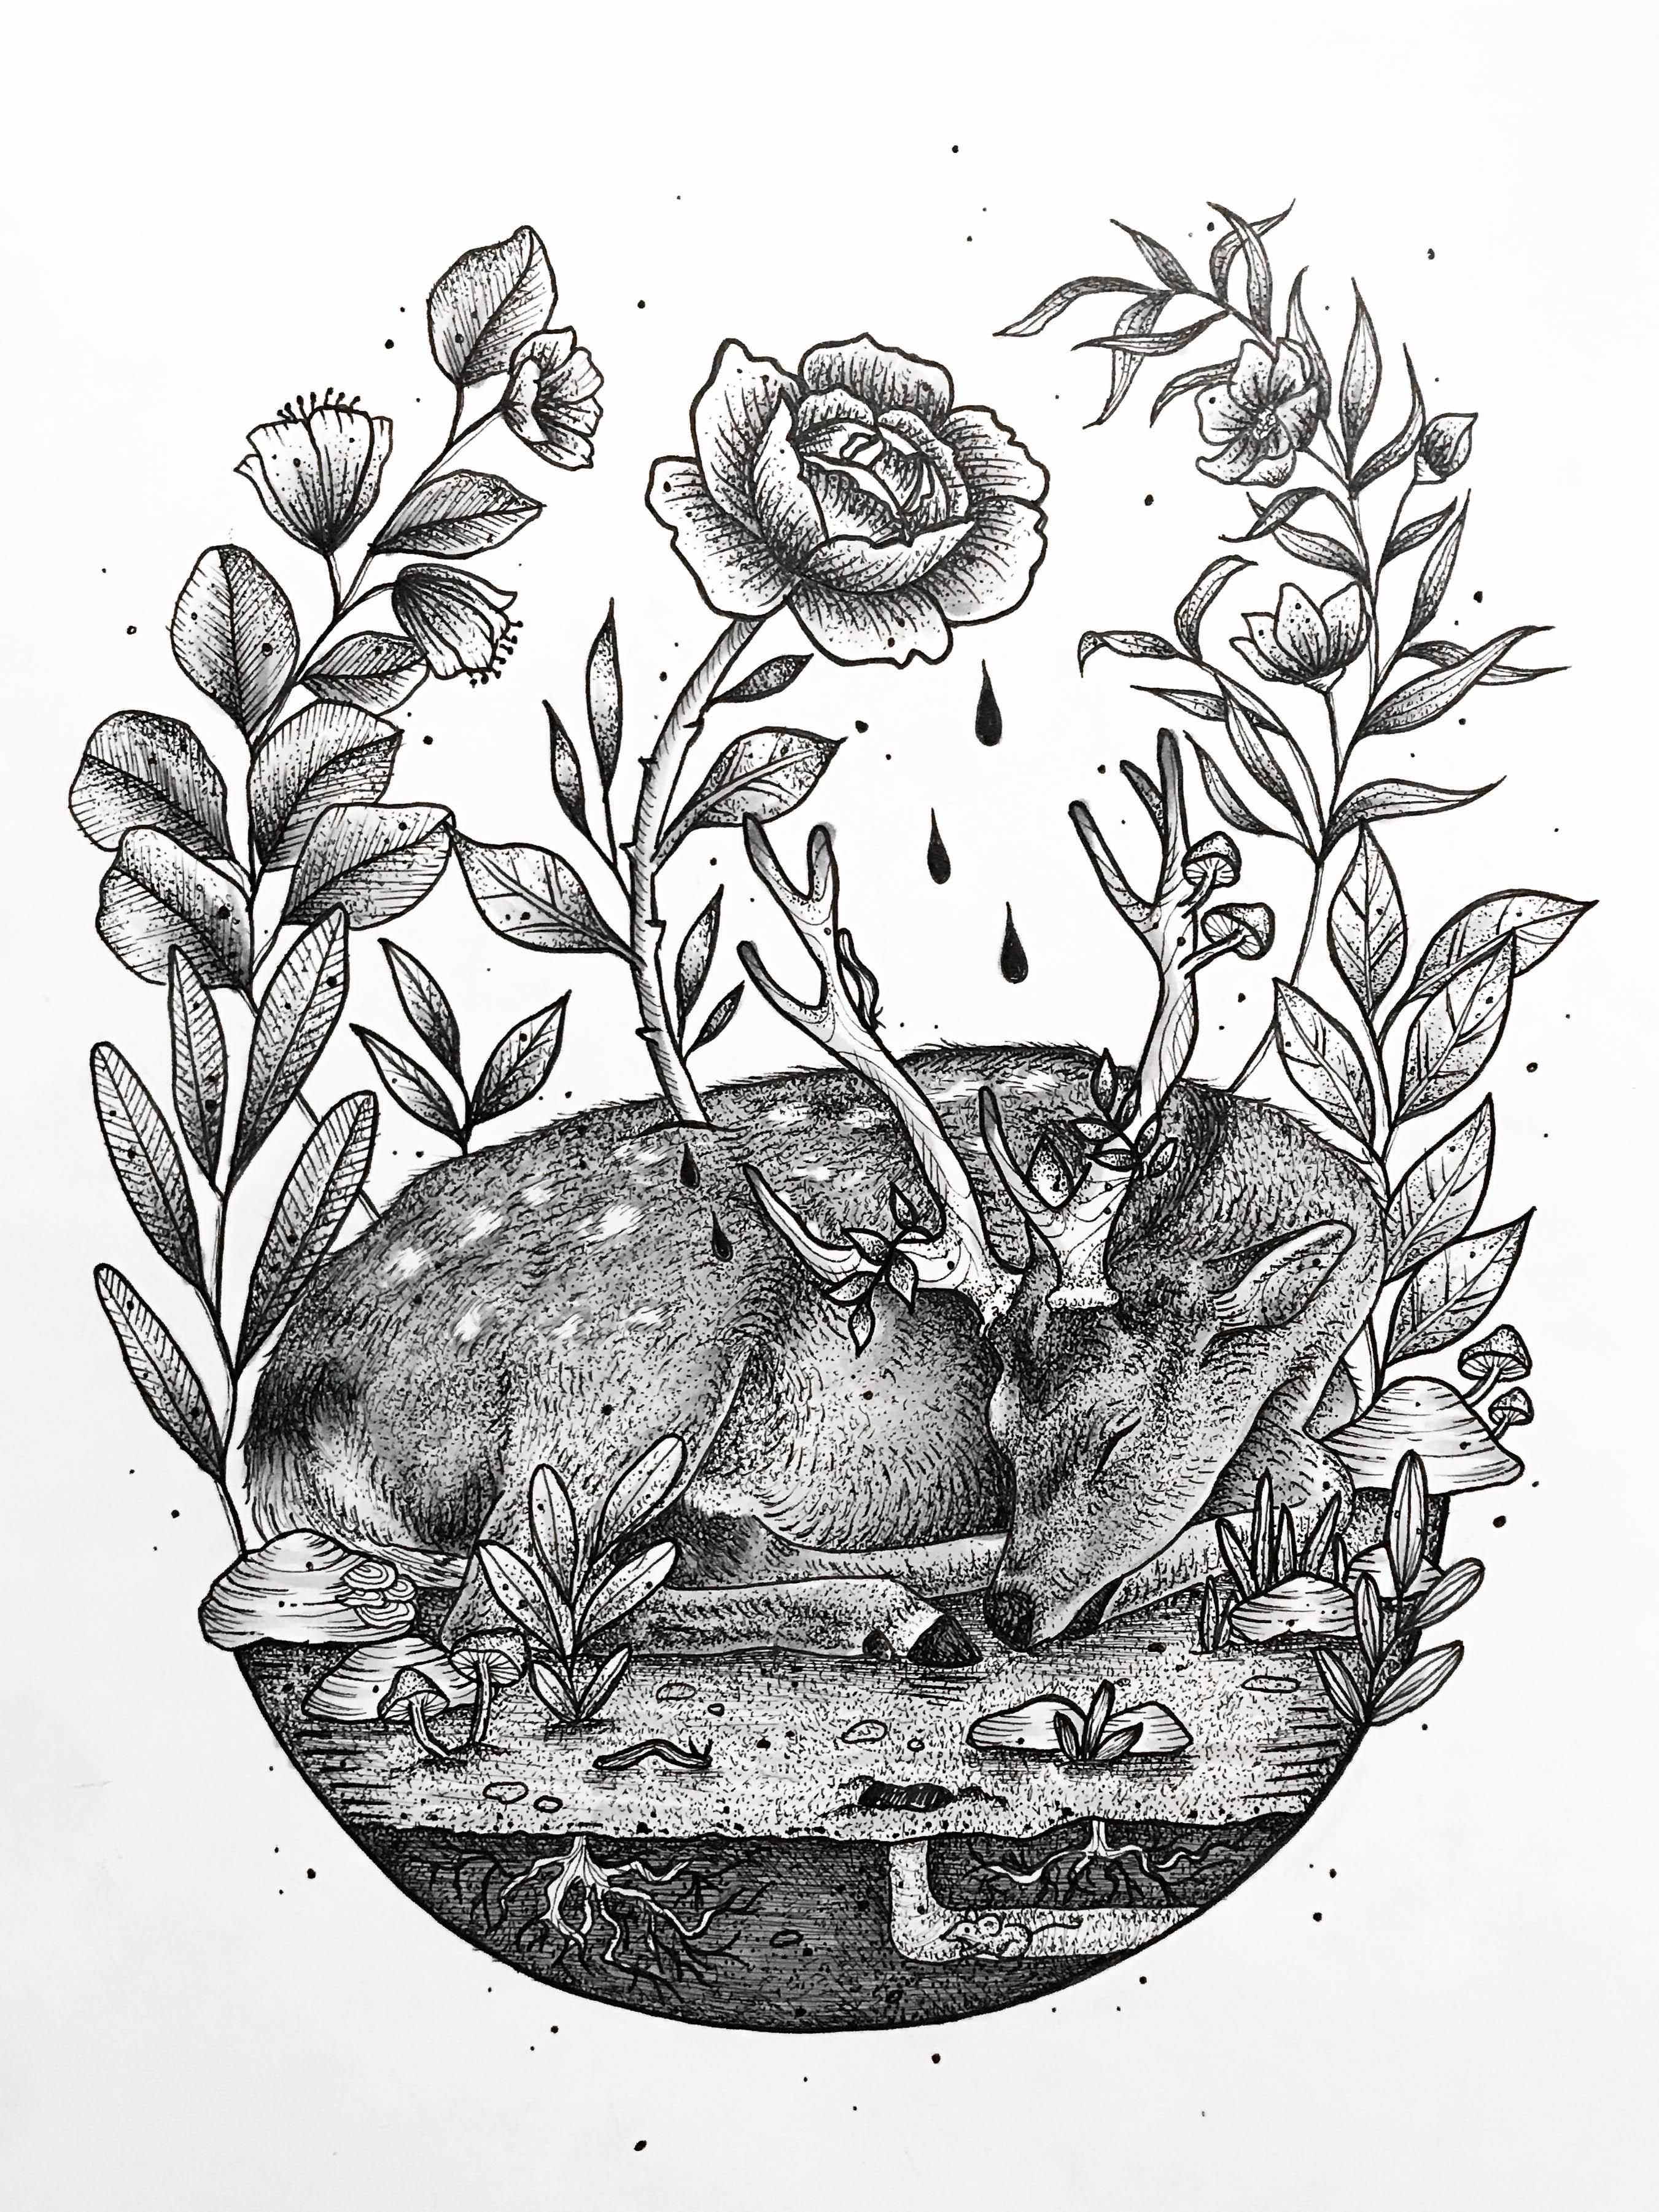 Sleeping deer illustration